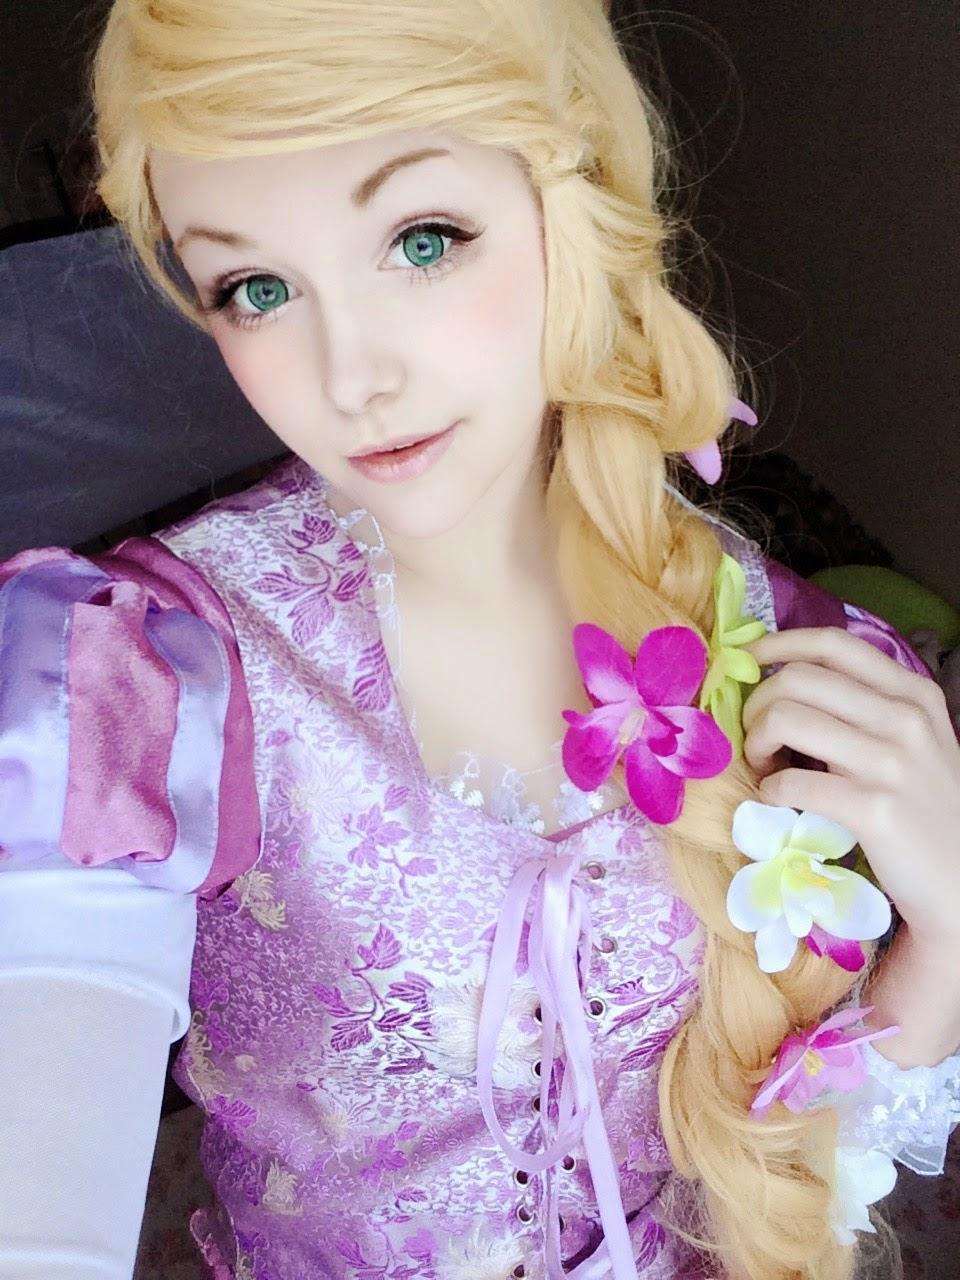 Rapunzel Cosplay With Dolly Eye Blytheye Green Circle Lenses